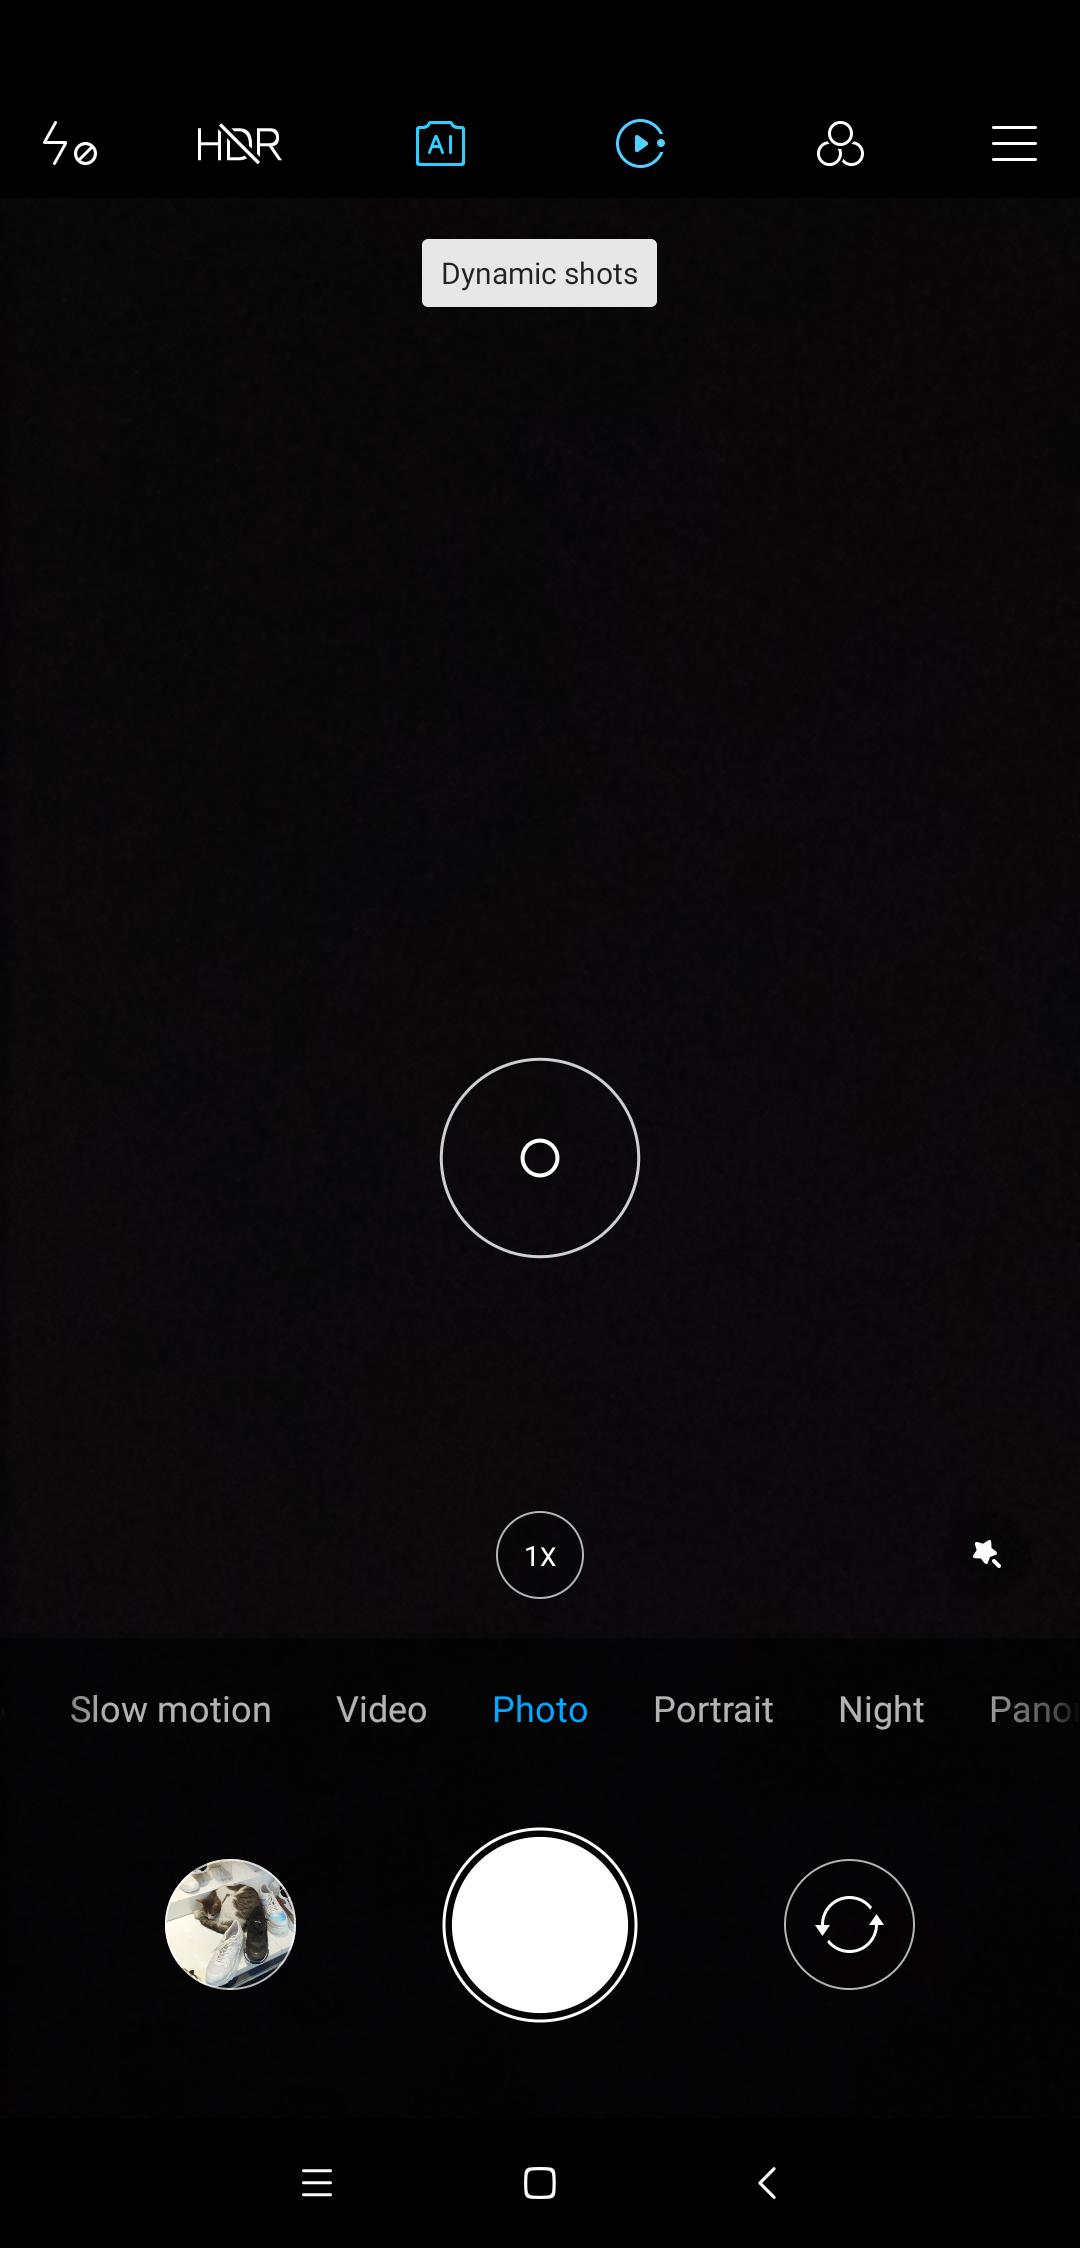 Screenshot_2019-03-29-02-22-07-929_com.android.camera.png